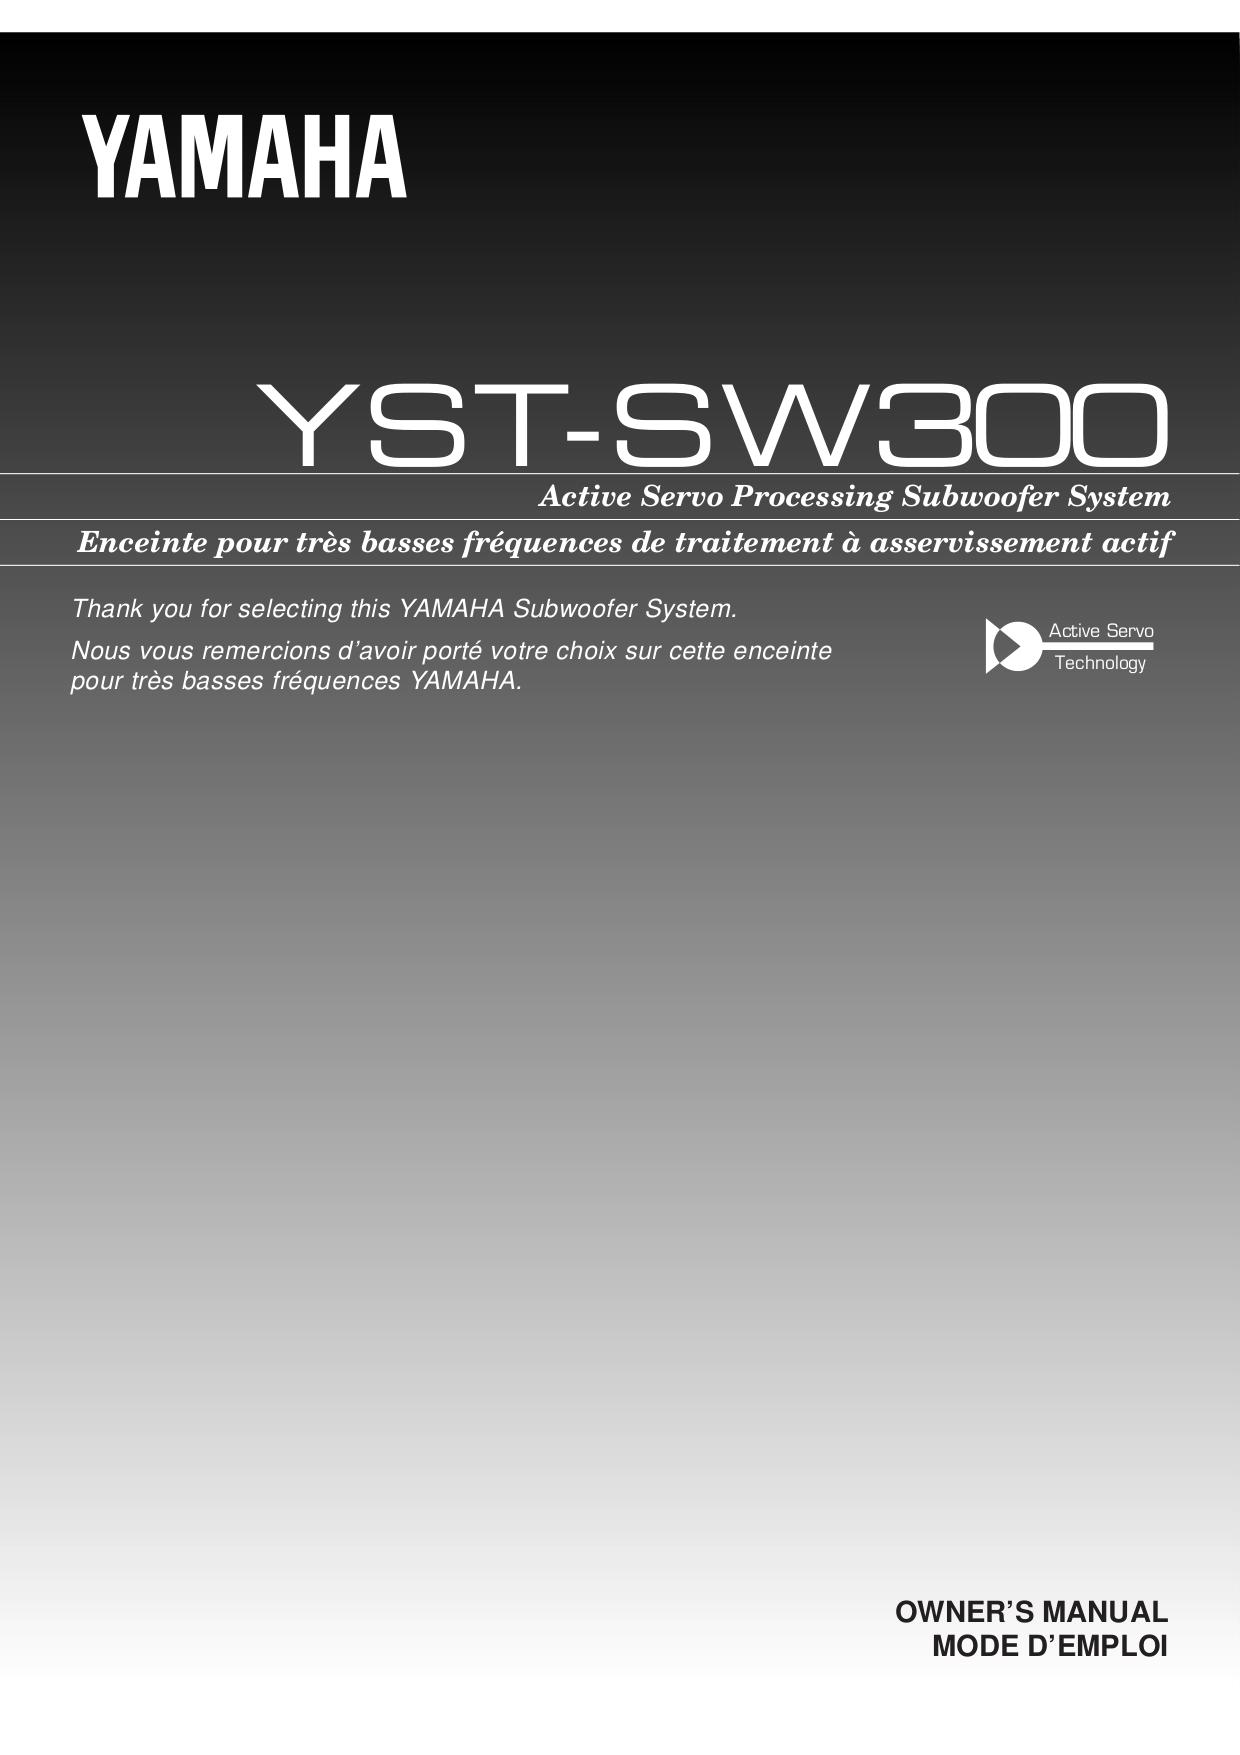 pdf for Yamaha Subwoofer YST-SW300 manual